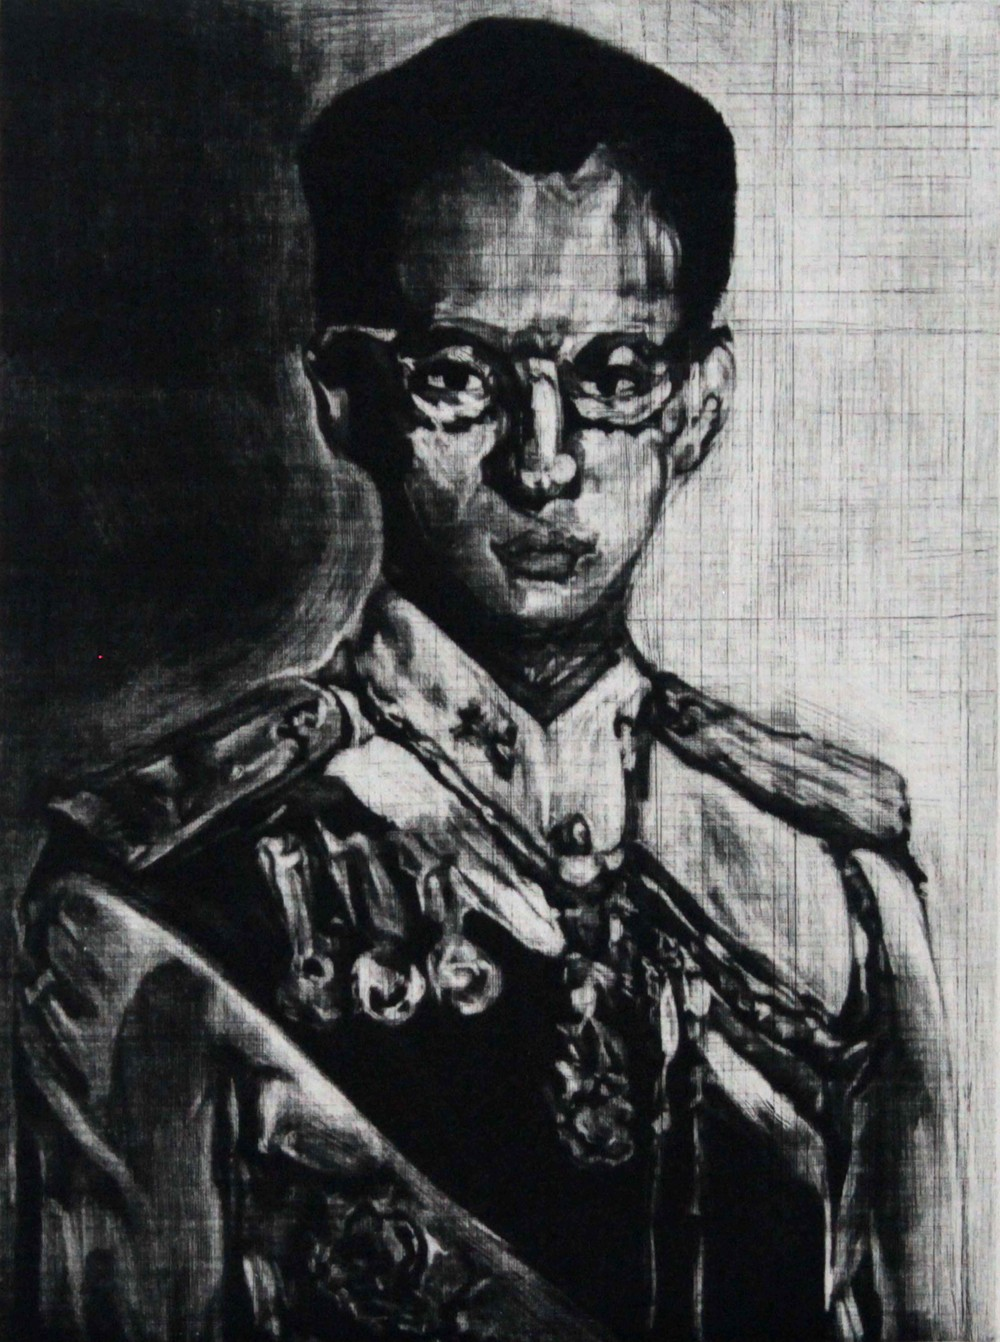 Kitikong Tilokwattanotai   King Bhumibul  ,2014,Etching,Image size: 20x15 cm